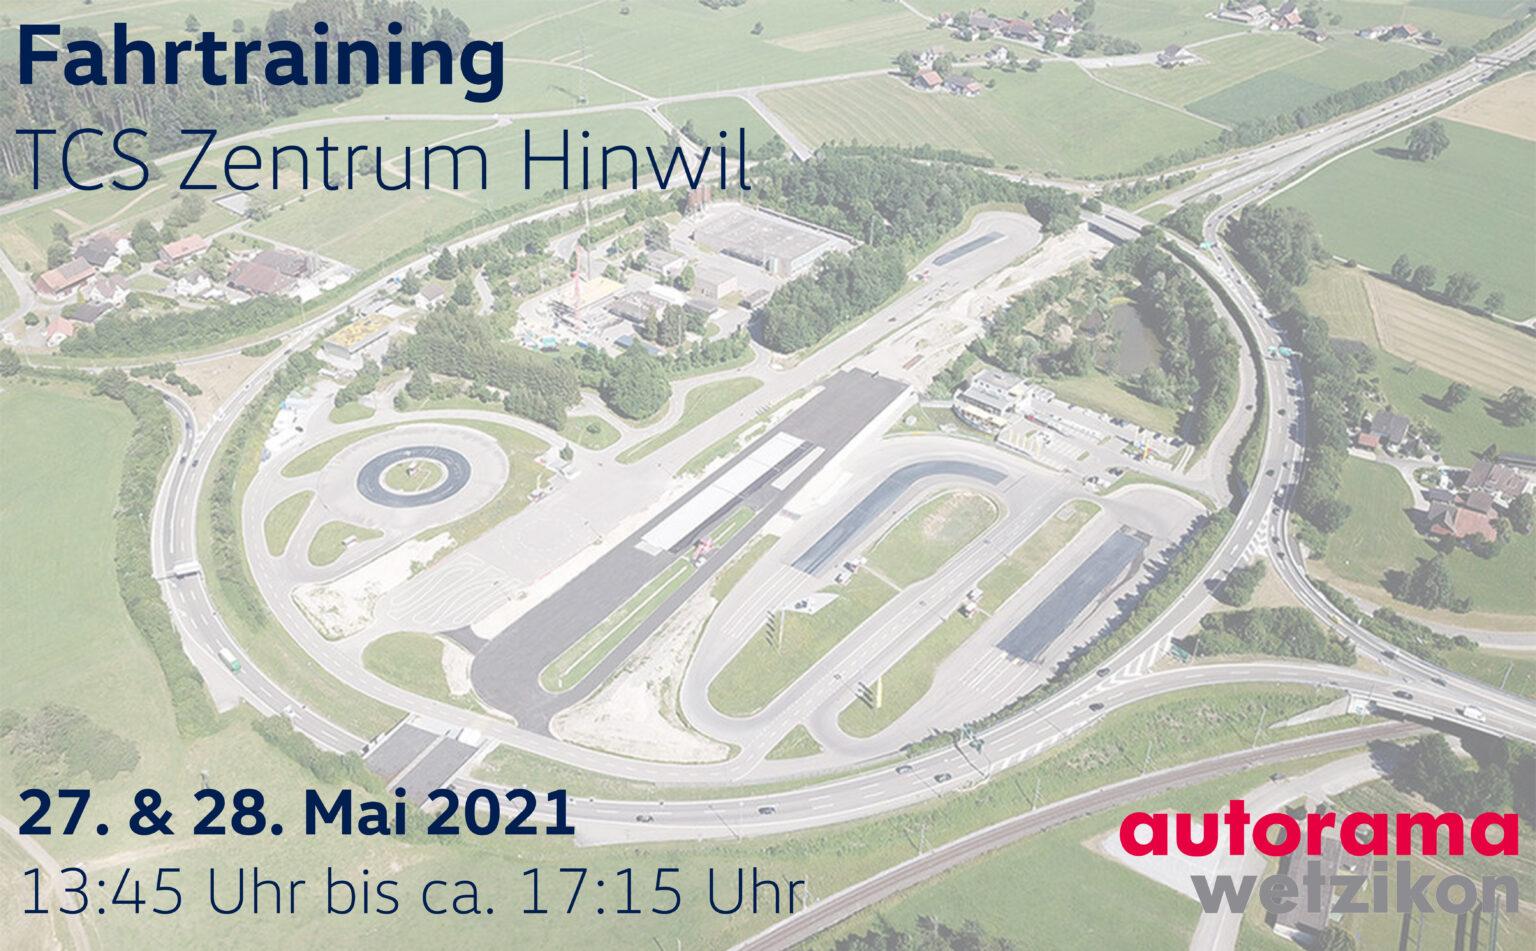 Fahrtraining - Autorama AG Wetzikon